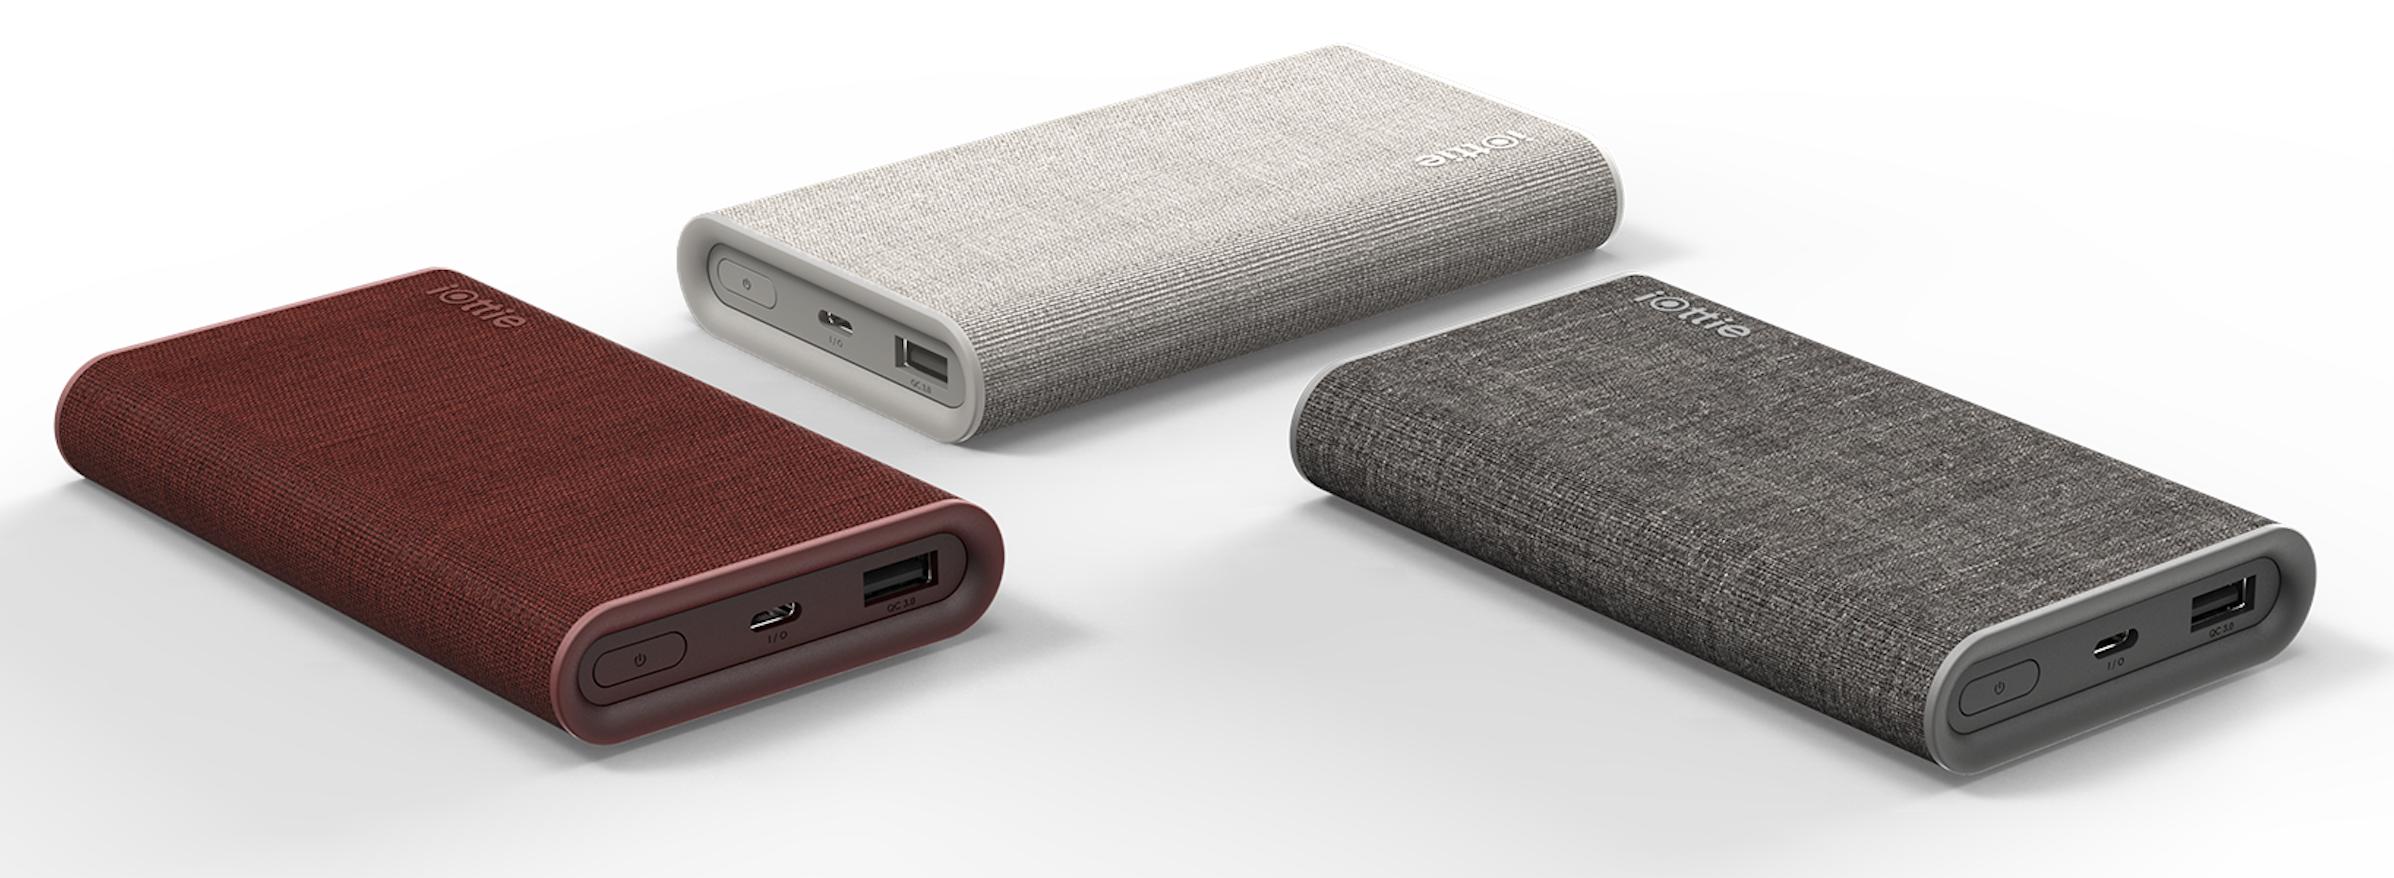 iOttie unveils Alexa-enabled iPhone car mount - 9to5Mac